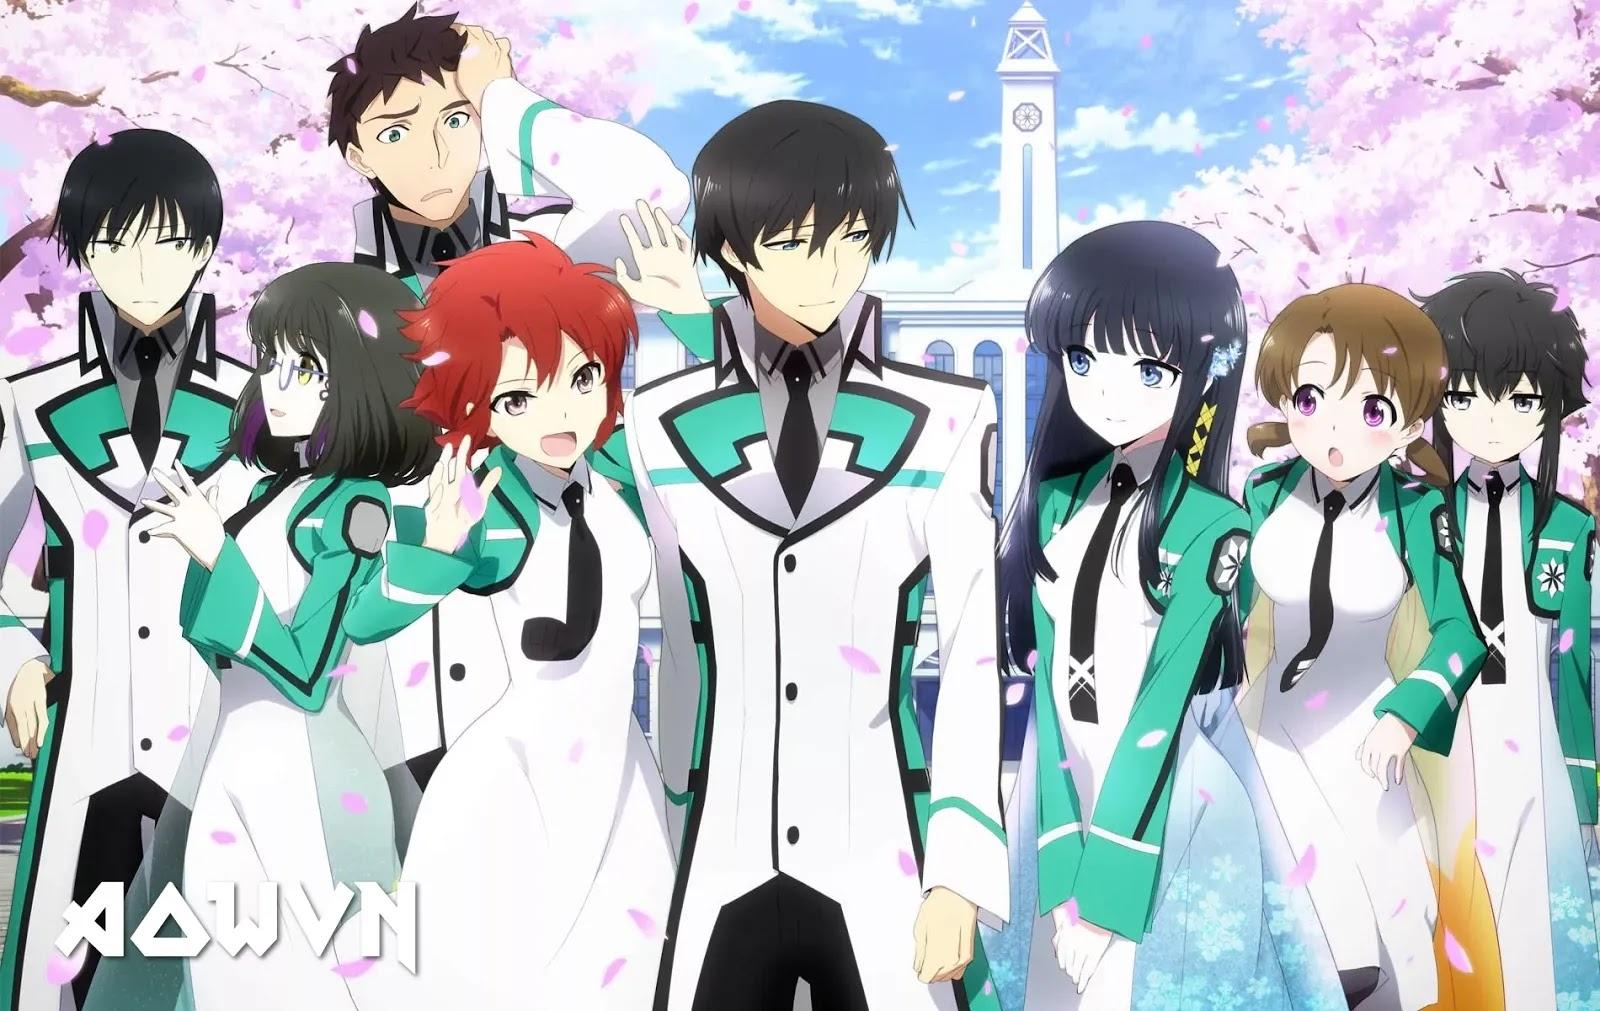 AowVN.org m%2B%25281%2529 - [ Anime 3gp Mp4 ] Mahouka Koukou No Rettousei BD | Vietsub - Tuyệt Hay